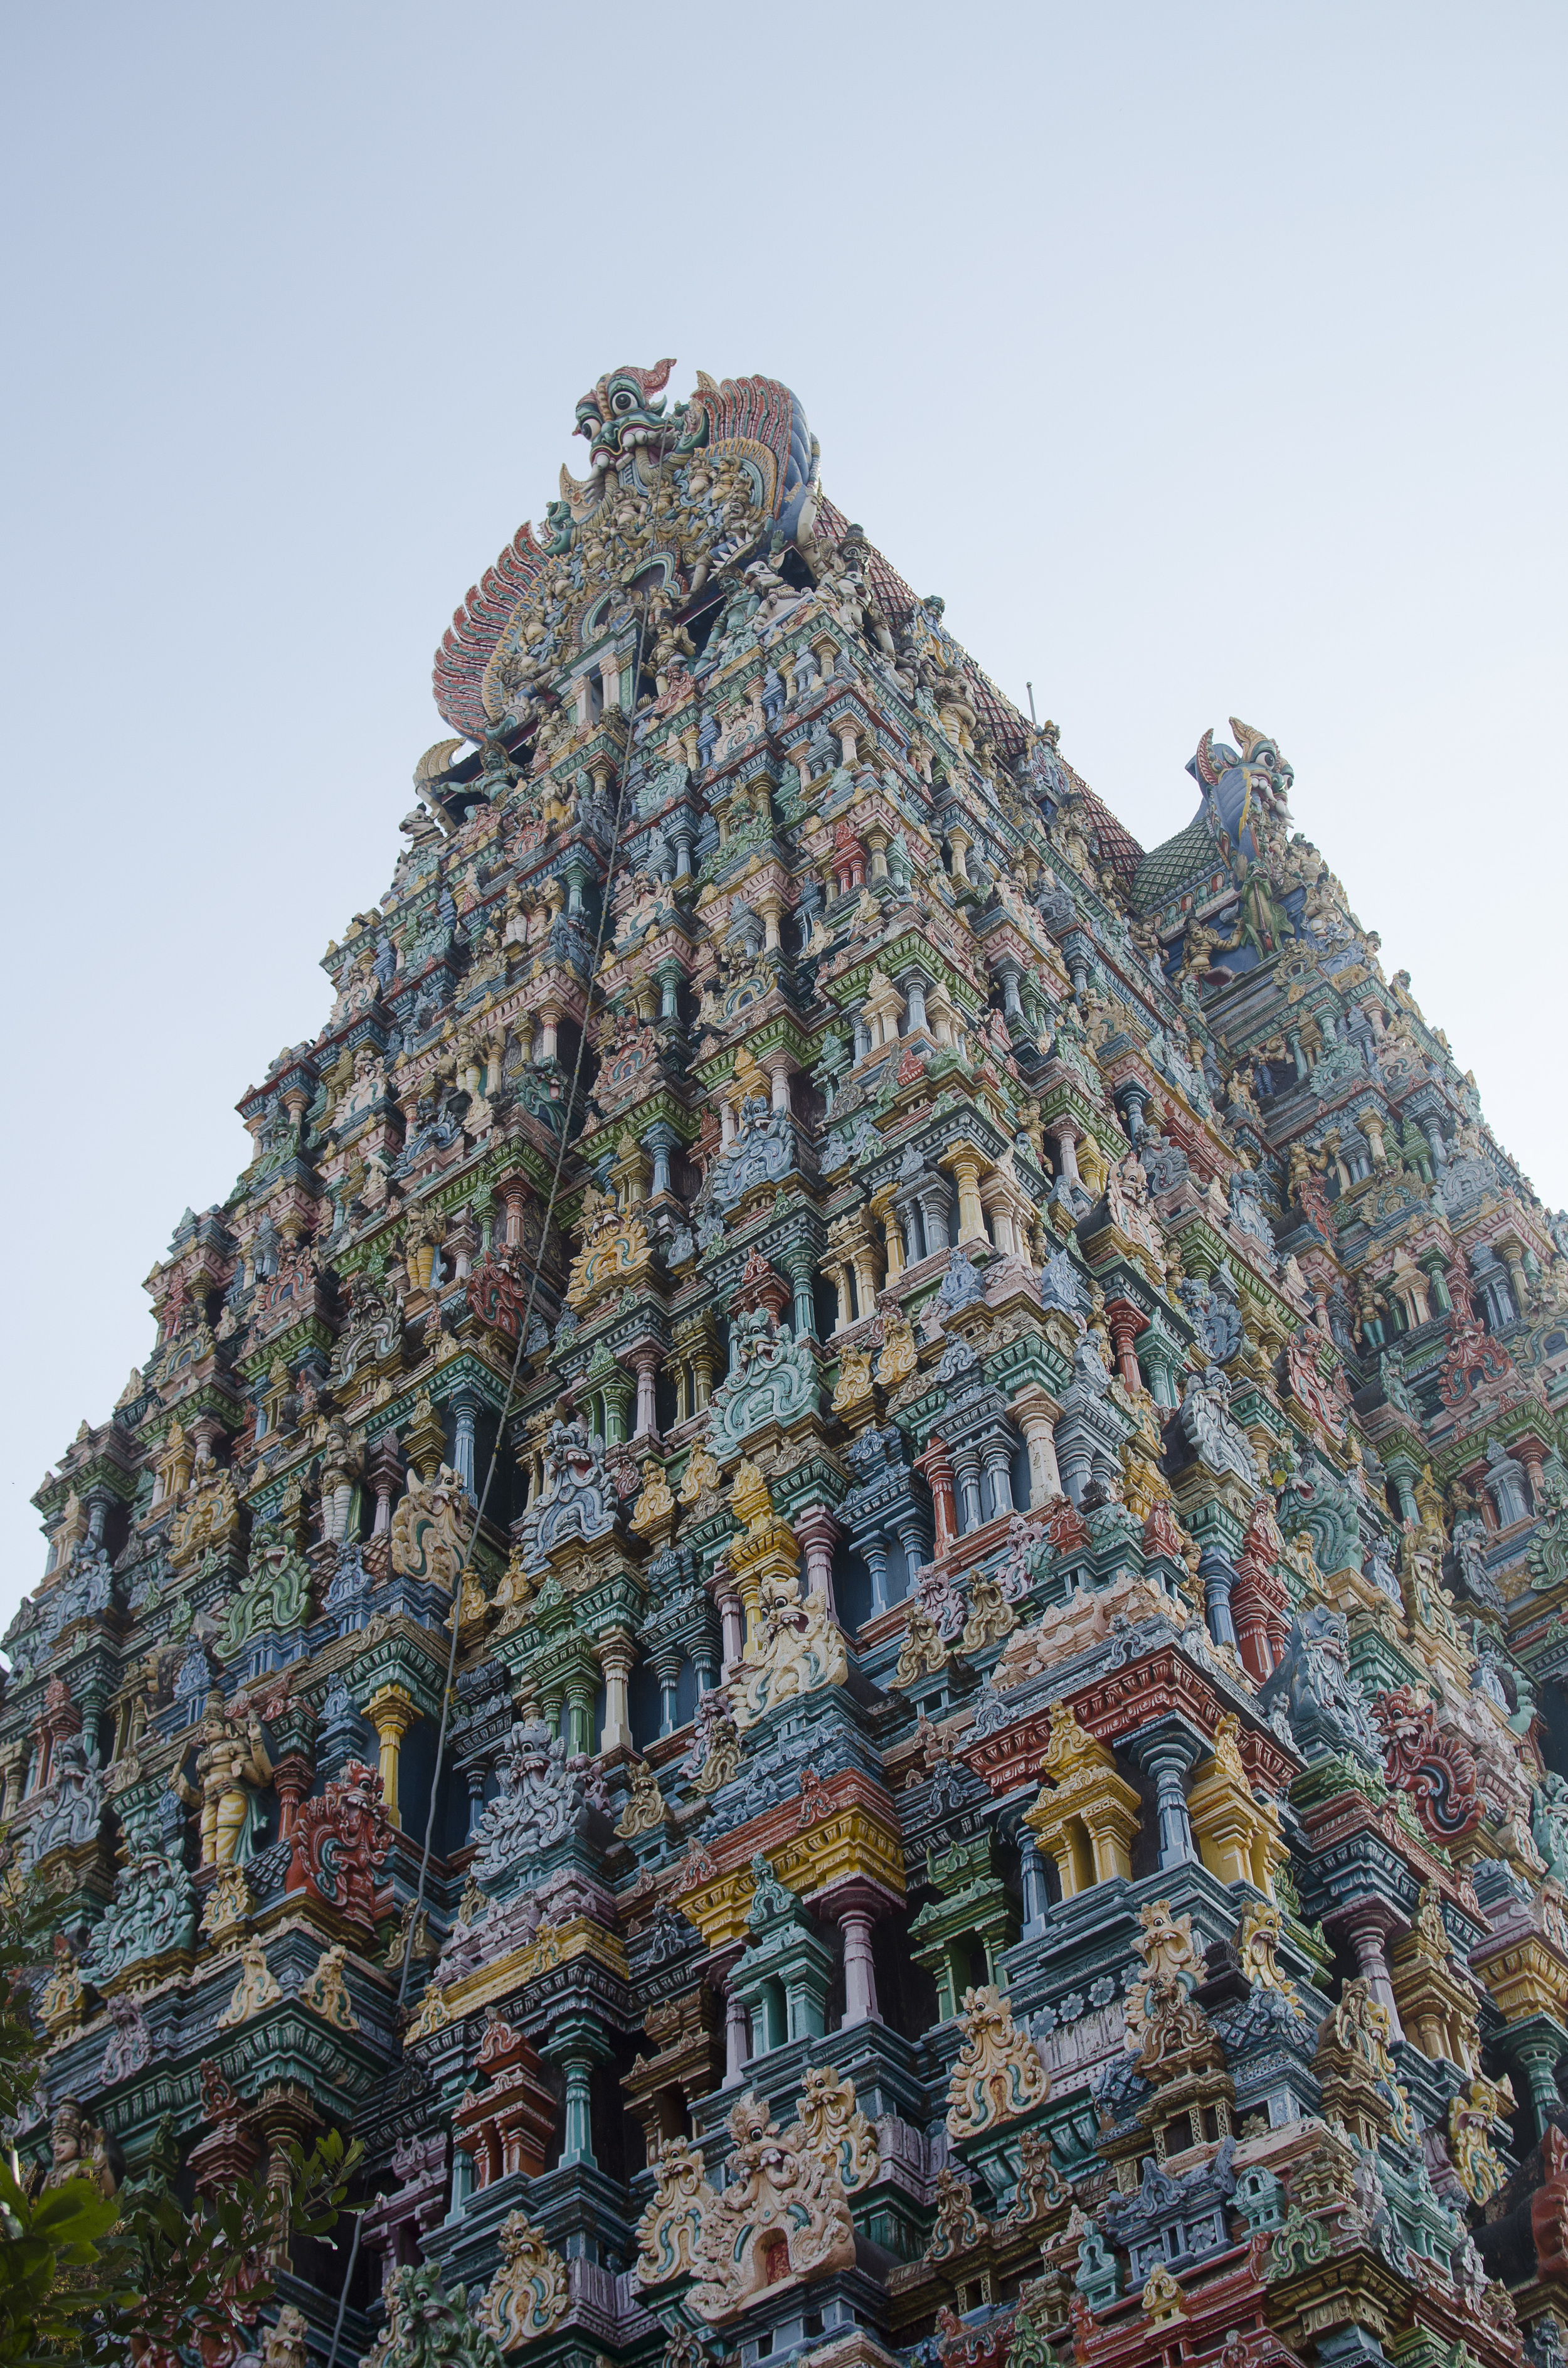 So we go - Madurai